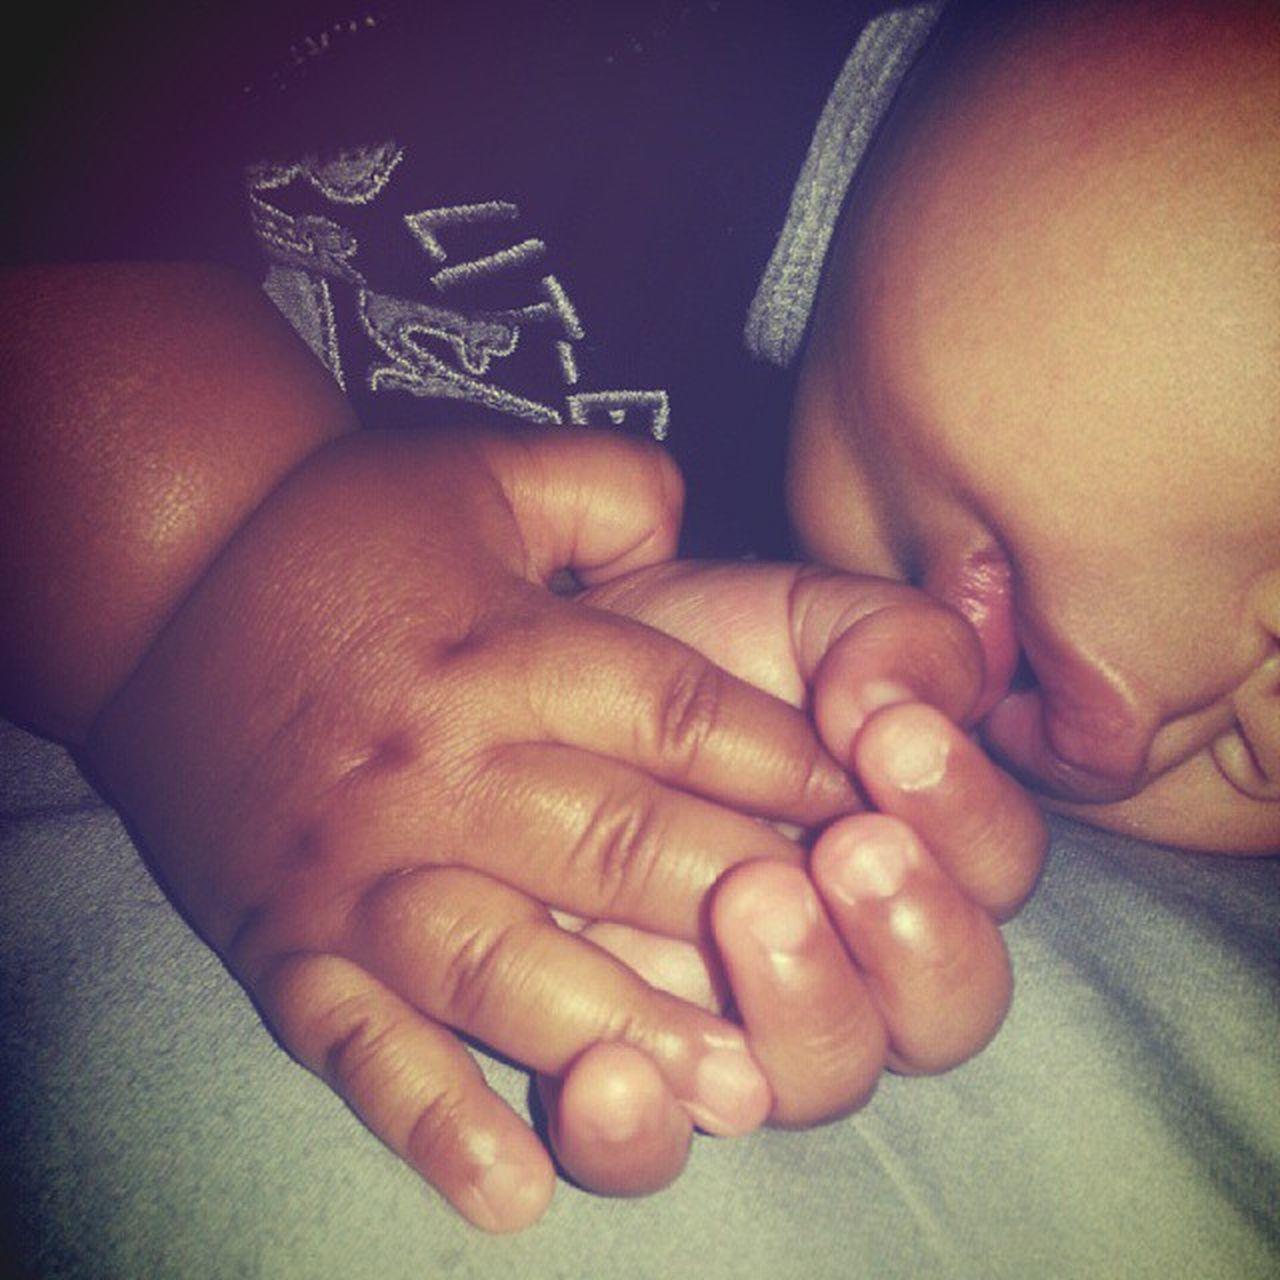 Sweet hands... 😍 SoSweet Prayinghands 🙏 HesGotMyBigManHands 👋 GoodThingHesABoy NotSoGoodForMe 😩 ThoseLipsTho 😗